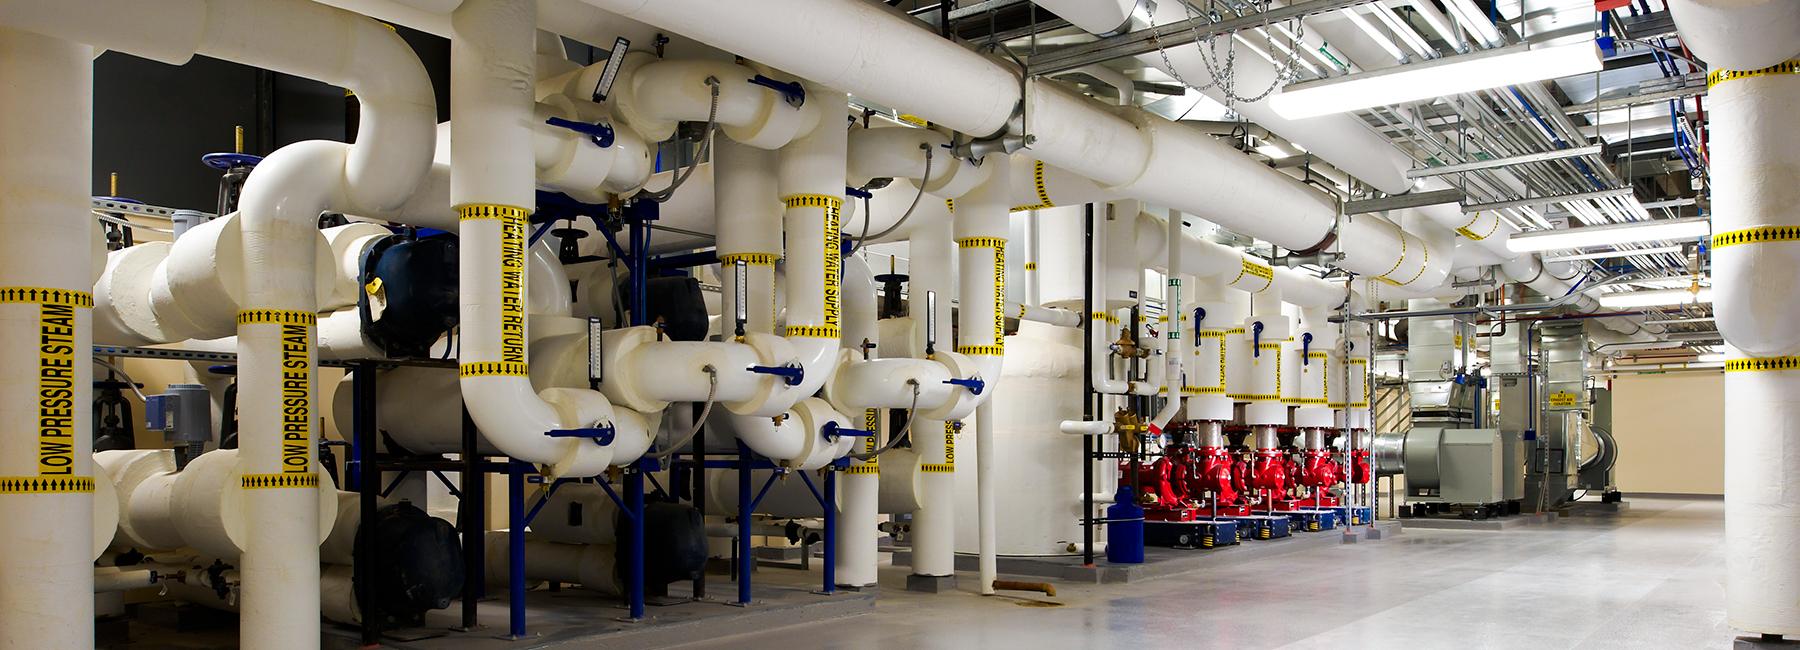 Minneapolis Mechanical Systems Engineered by Dunham Associates, Inc.